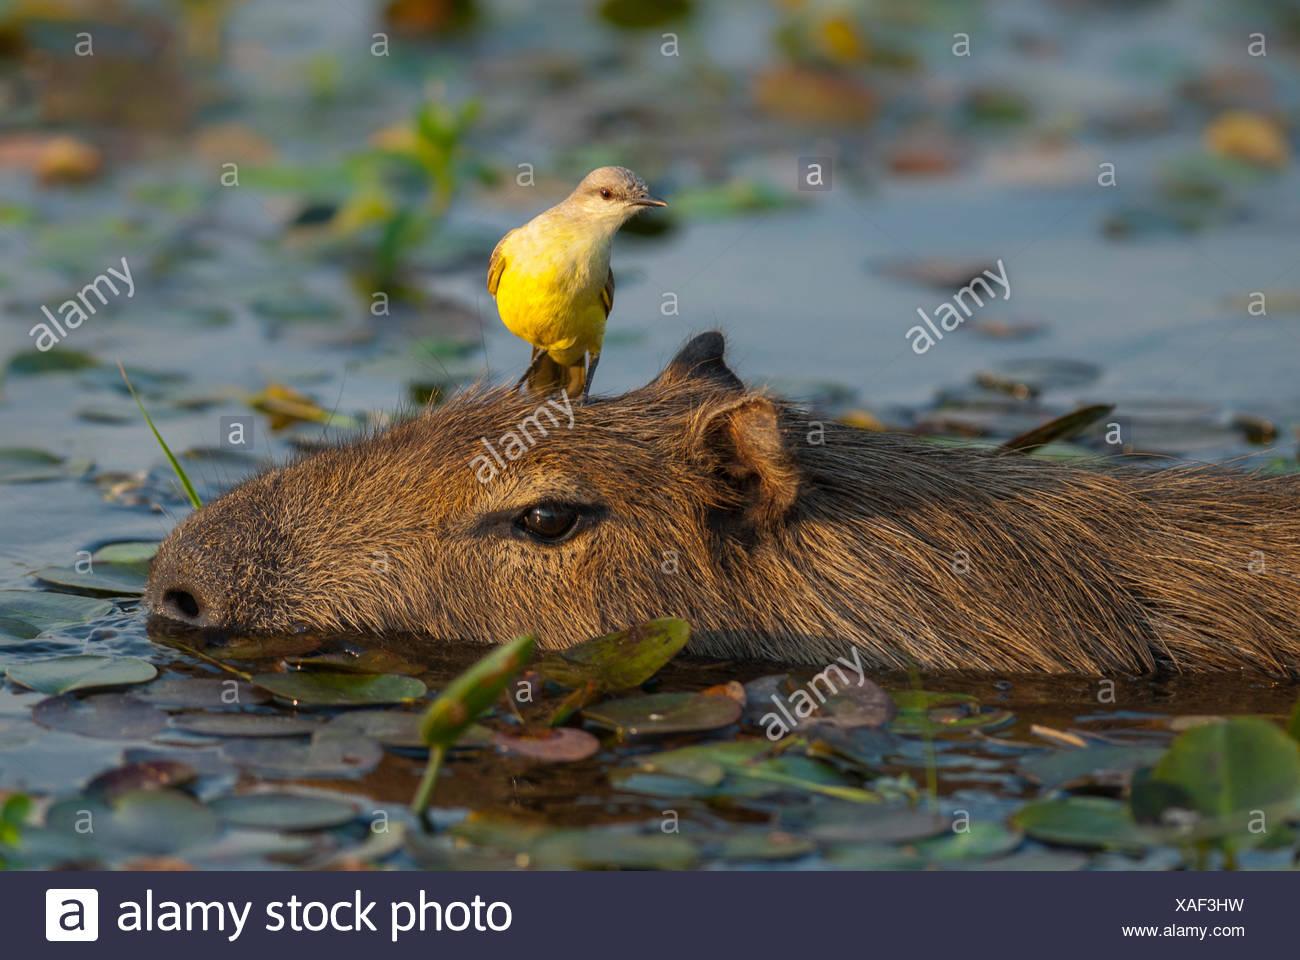 Cattle tyrant (Machetornis rixosus) perched on capibara¶ÿ (Hydrochoerus hydrochaeris)  Ibera Marshes, Corrientes Province, Argentina Stock Photo